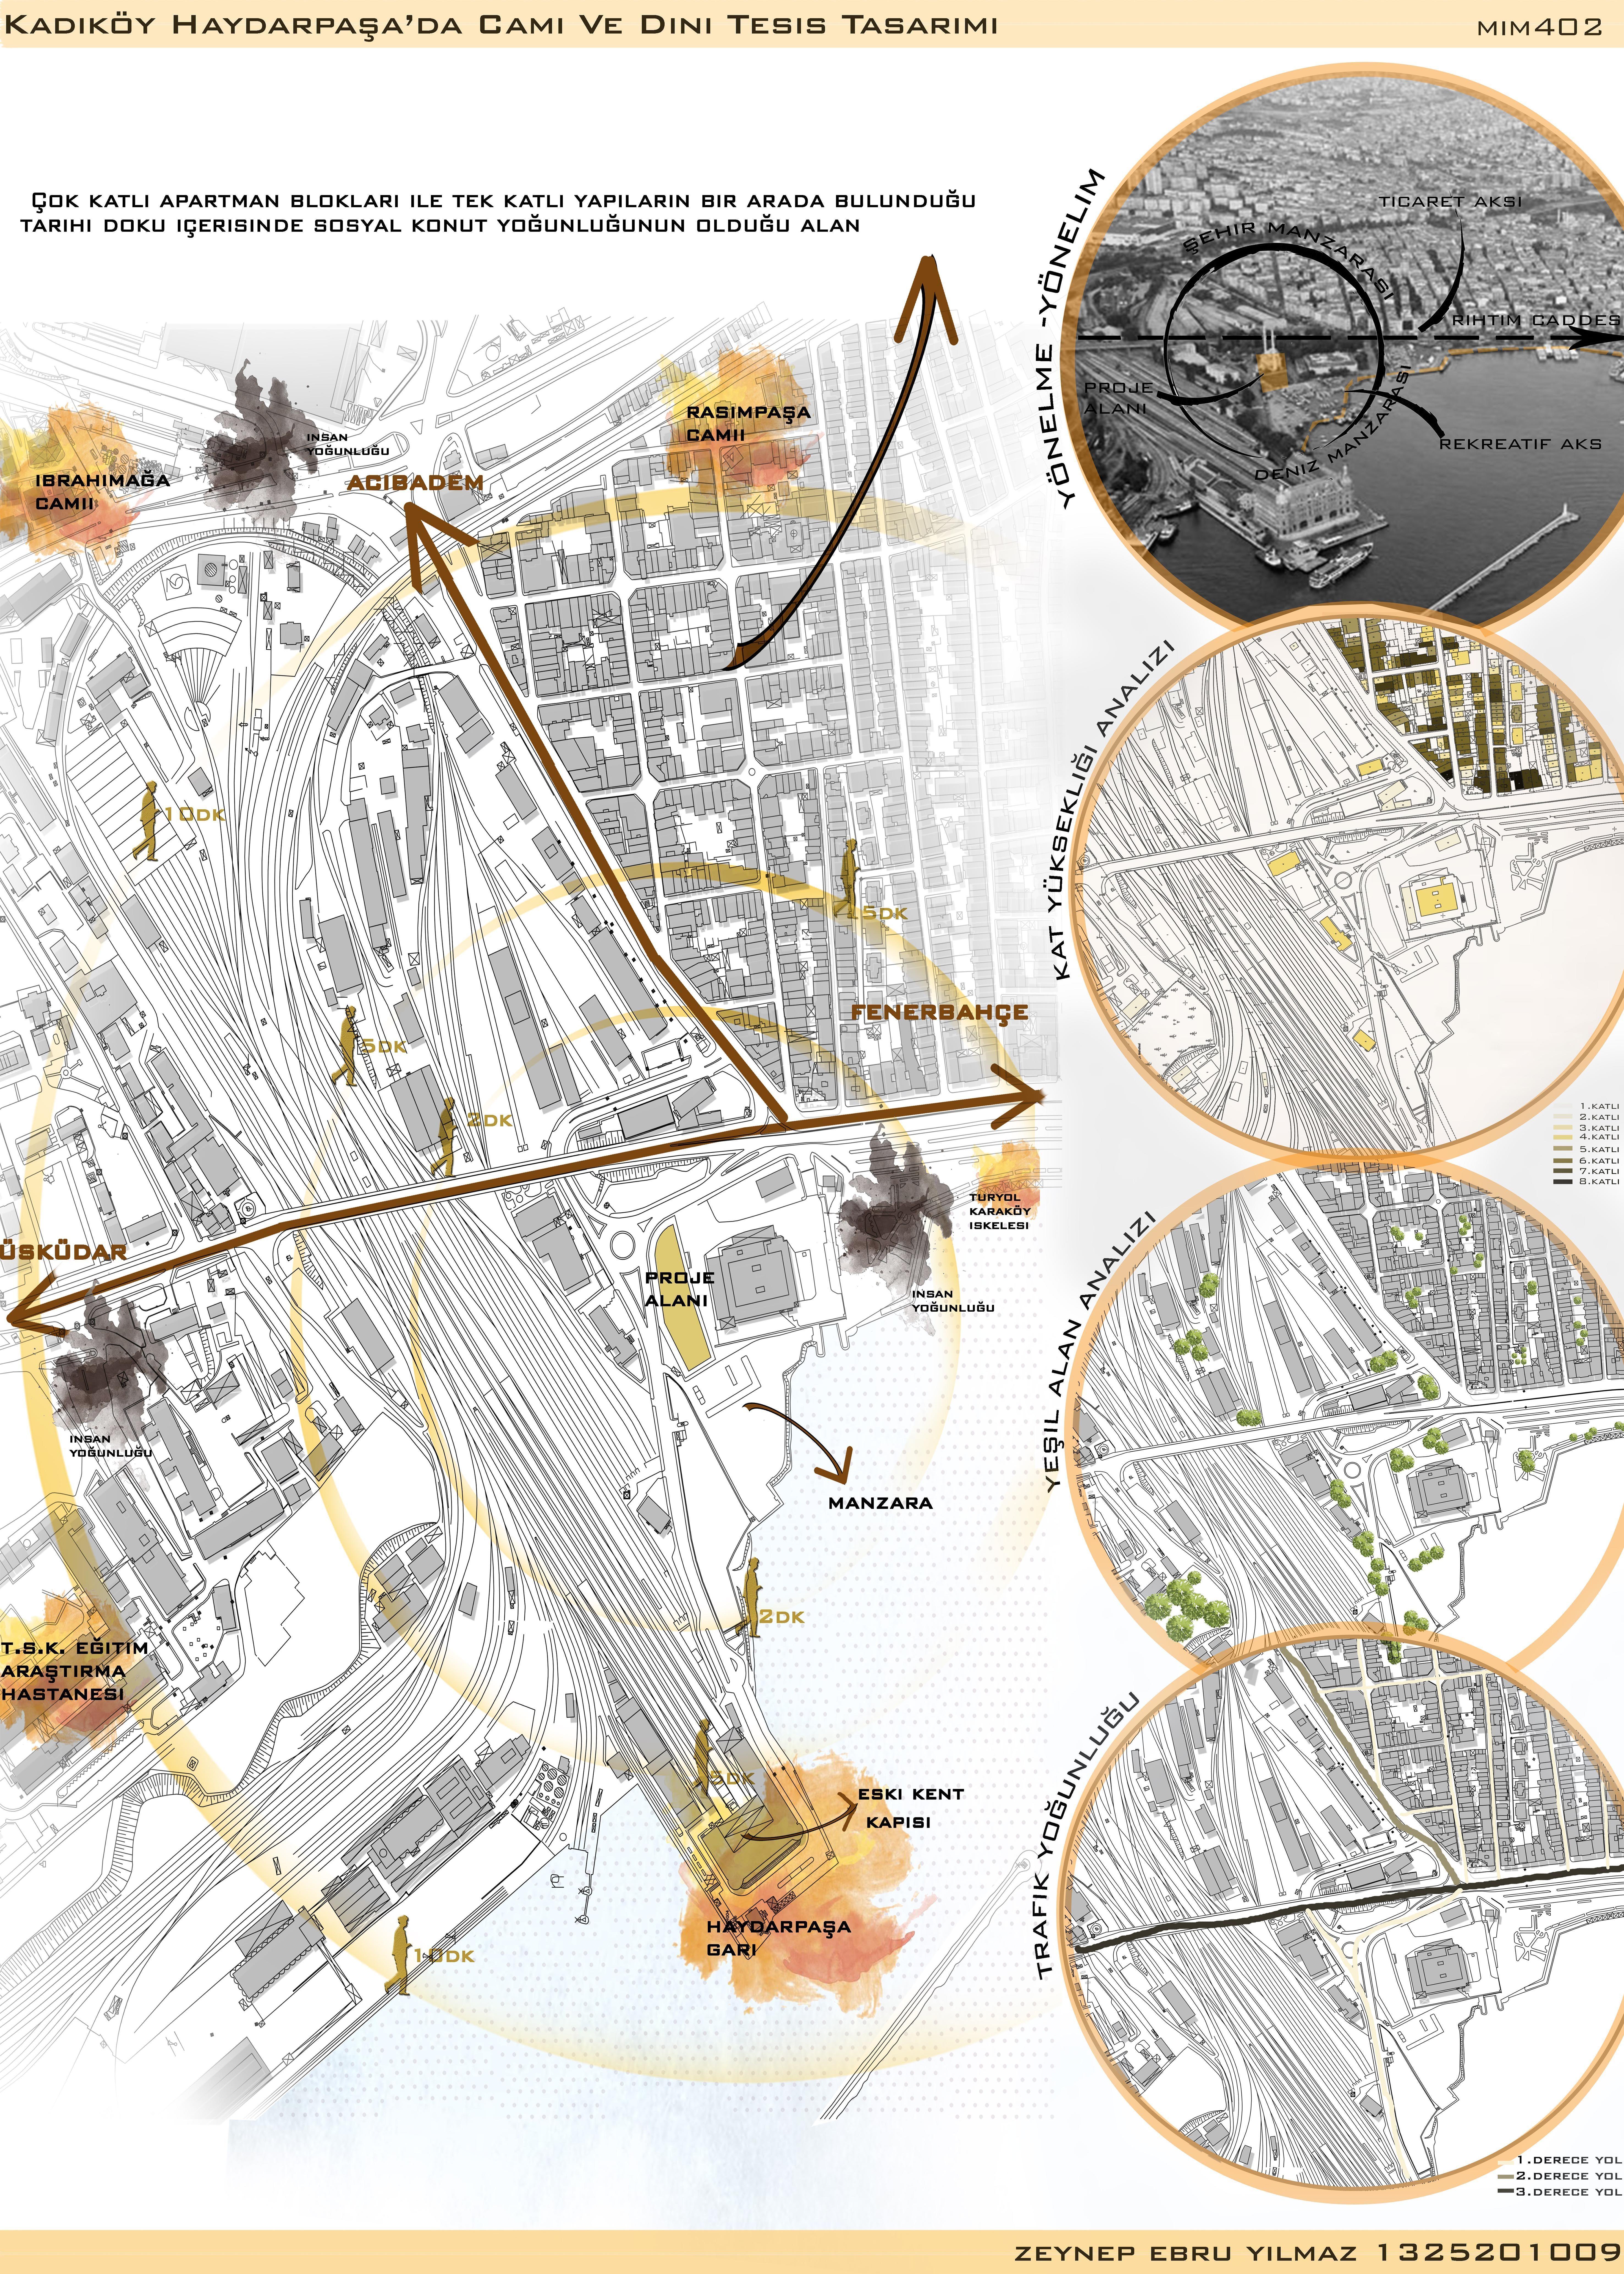 visual outcomes associated with photoshop # architektonischepräsentatio the plant plans - ceramic